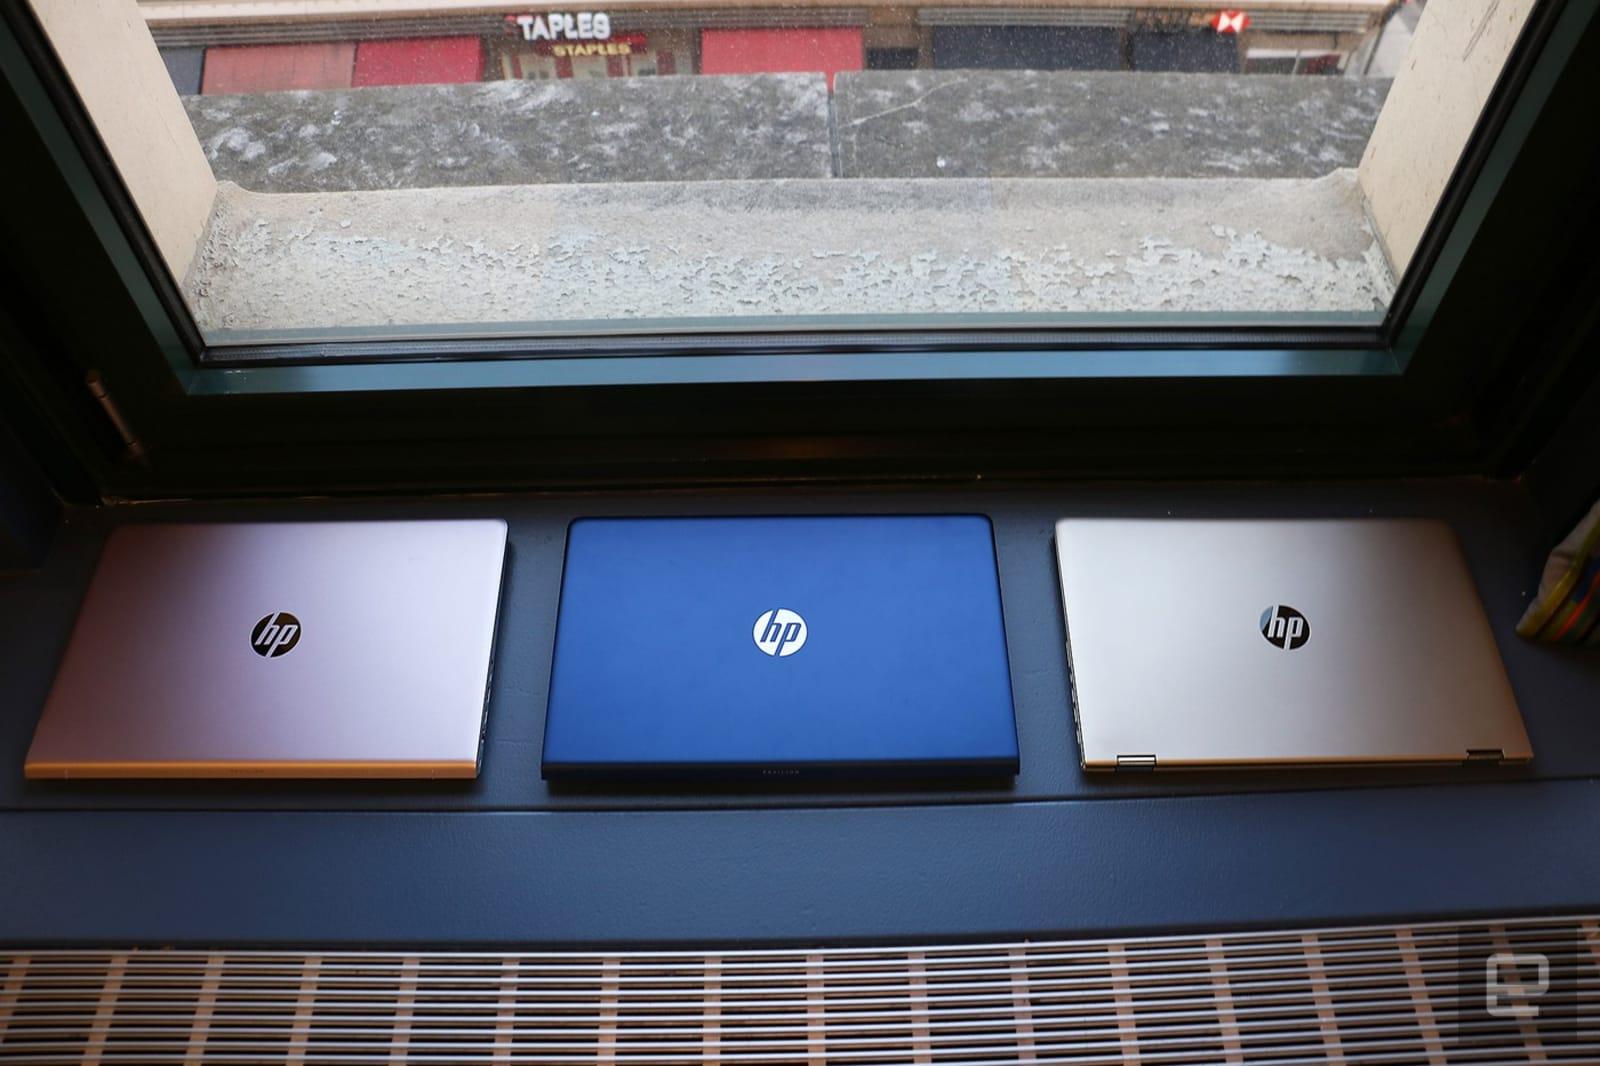 HP introduces new Pavilion laptops at    Coachella